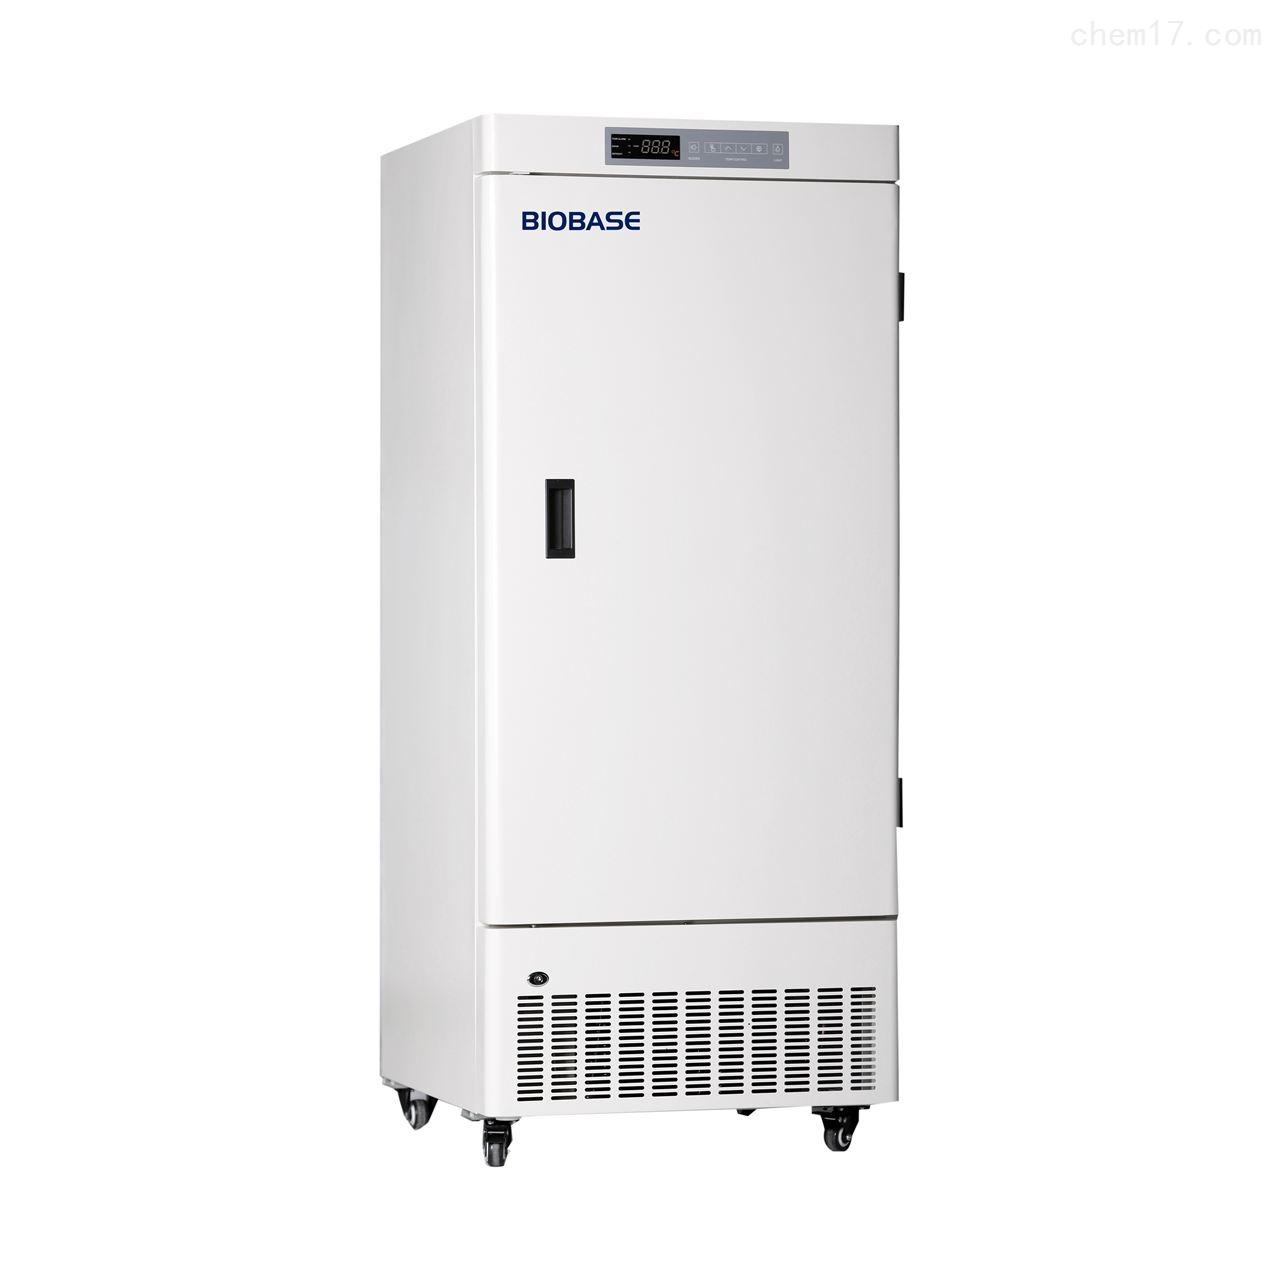 BIOBASE国产超低温冰箱型号价格